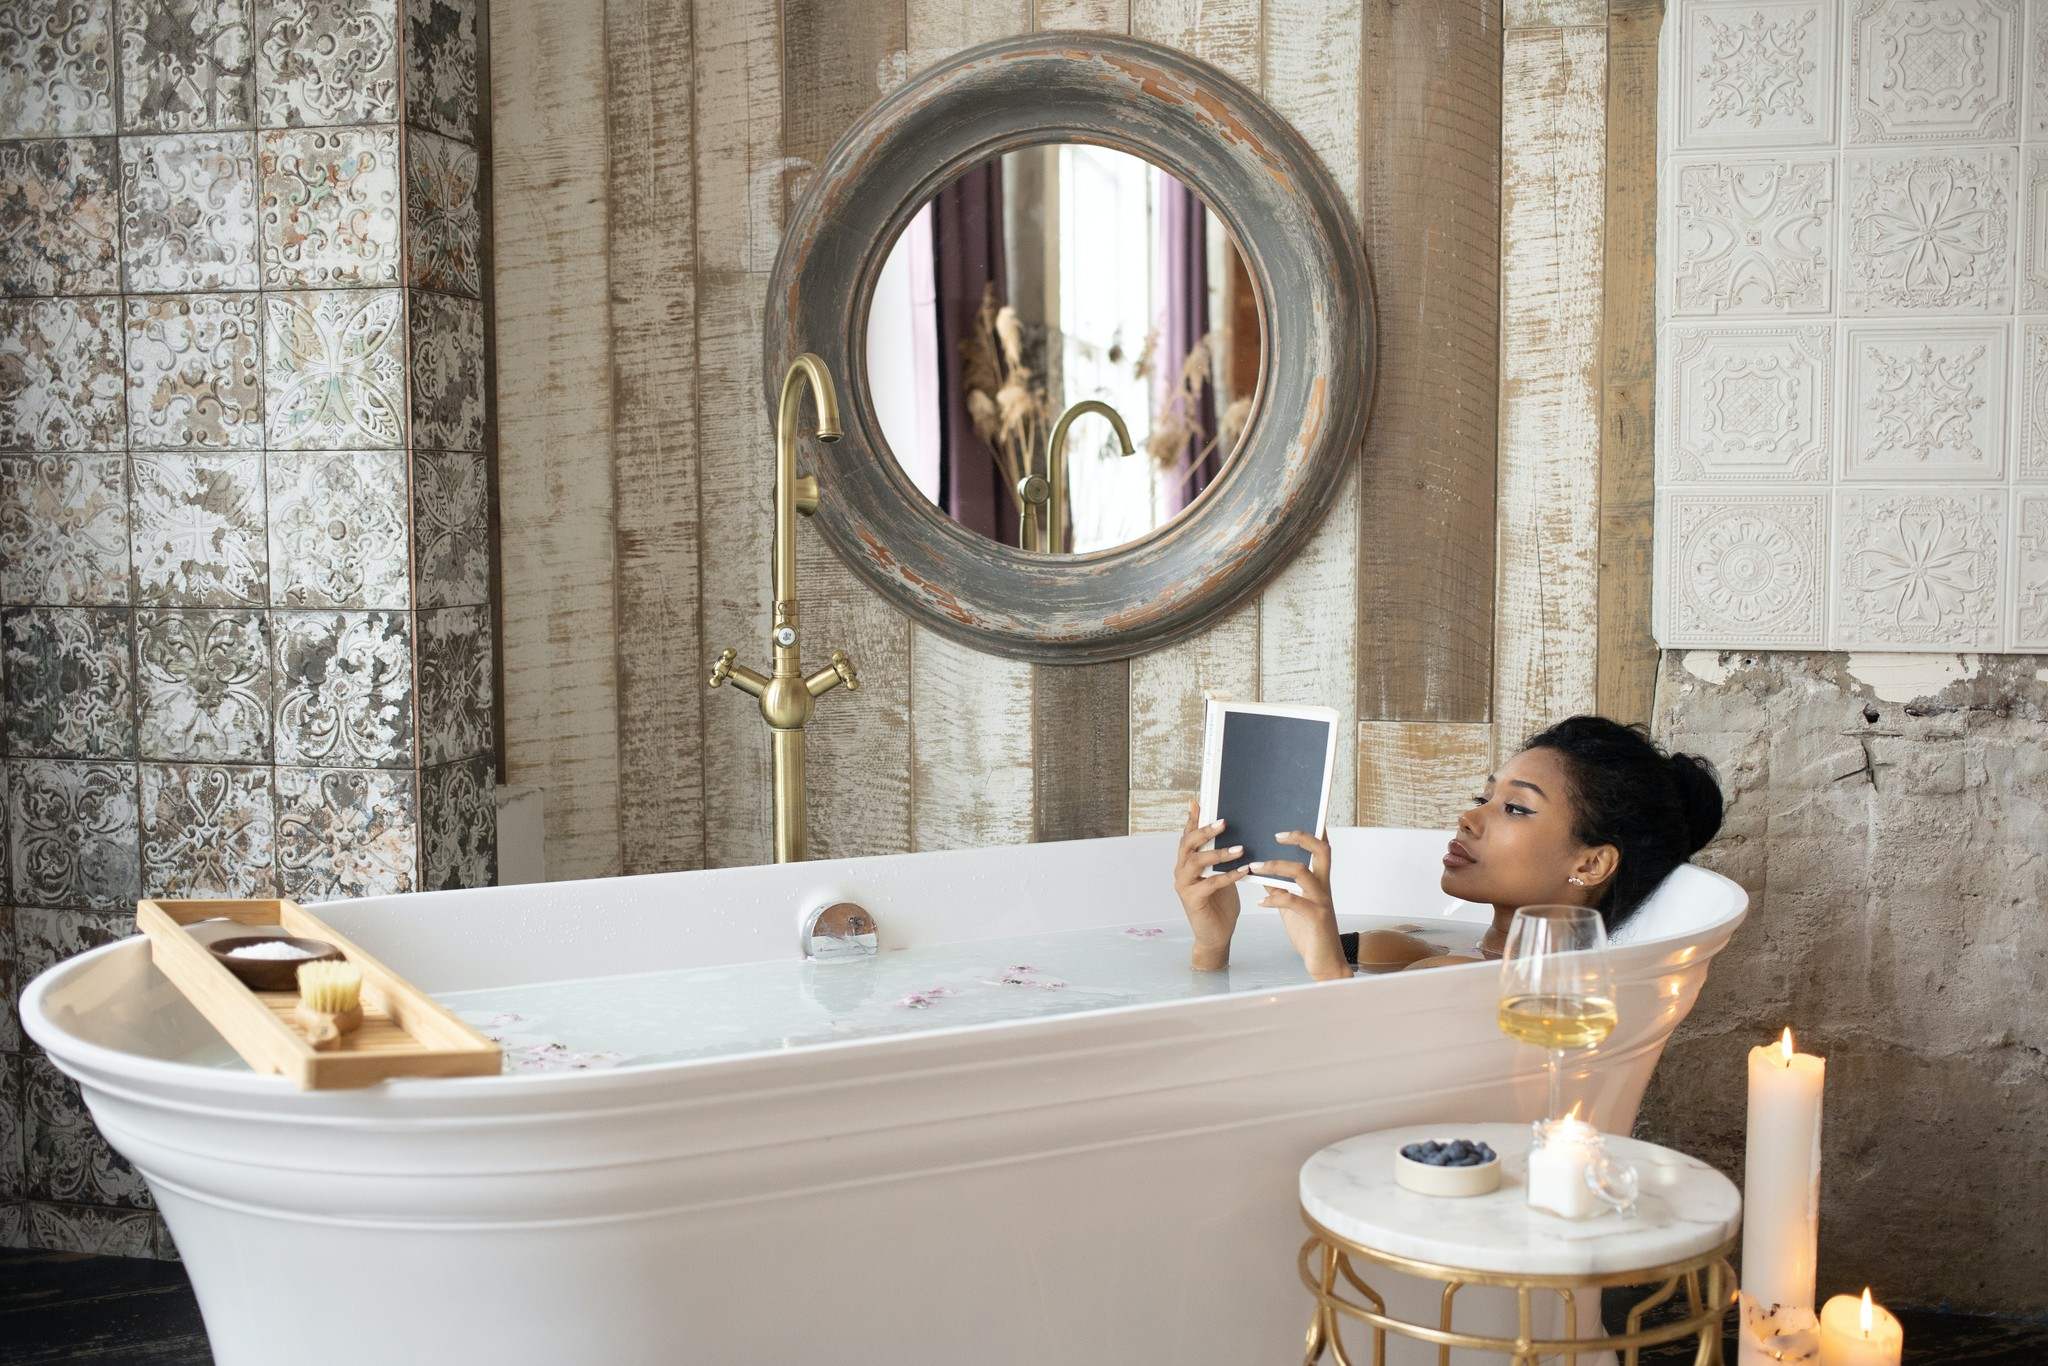 Badkamer- en douche-accessoires